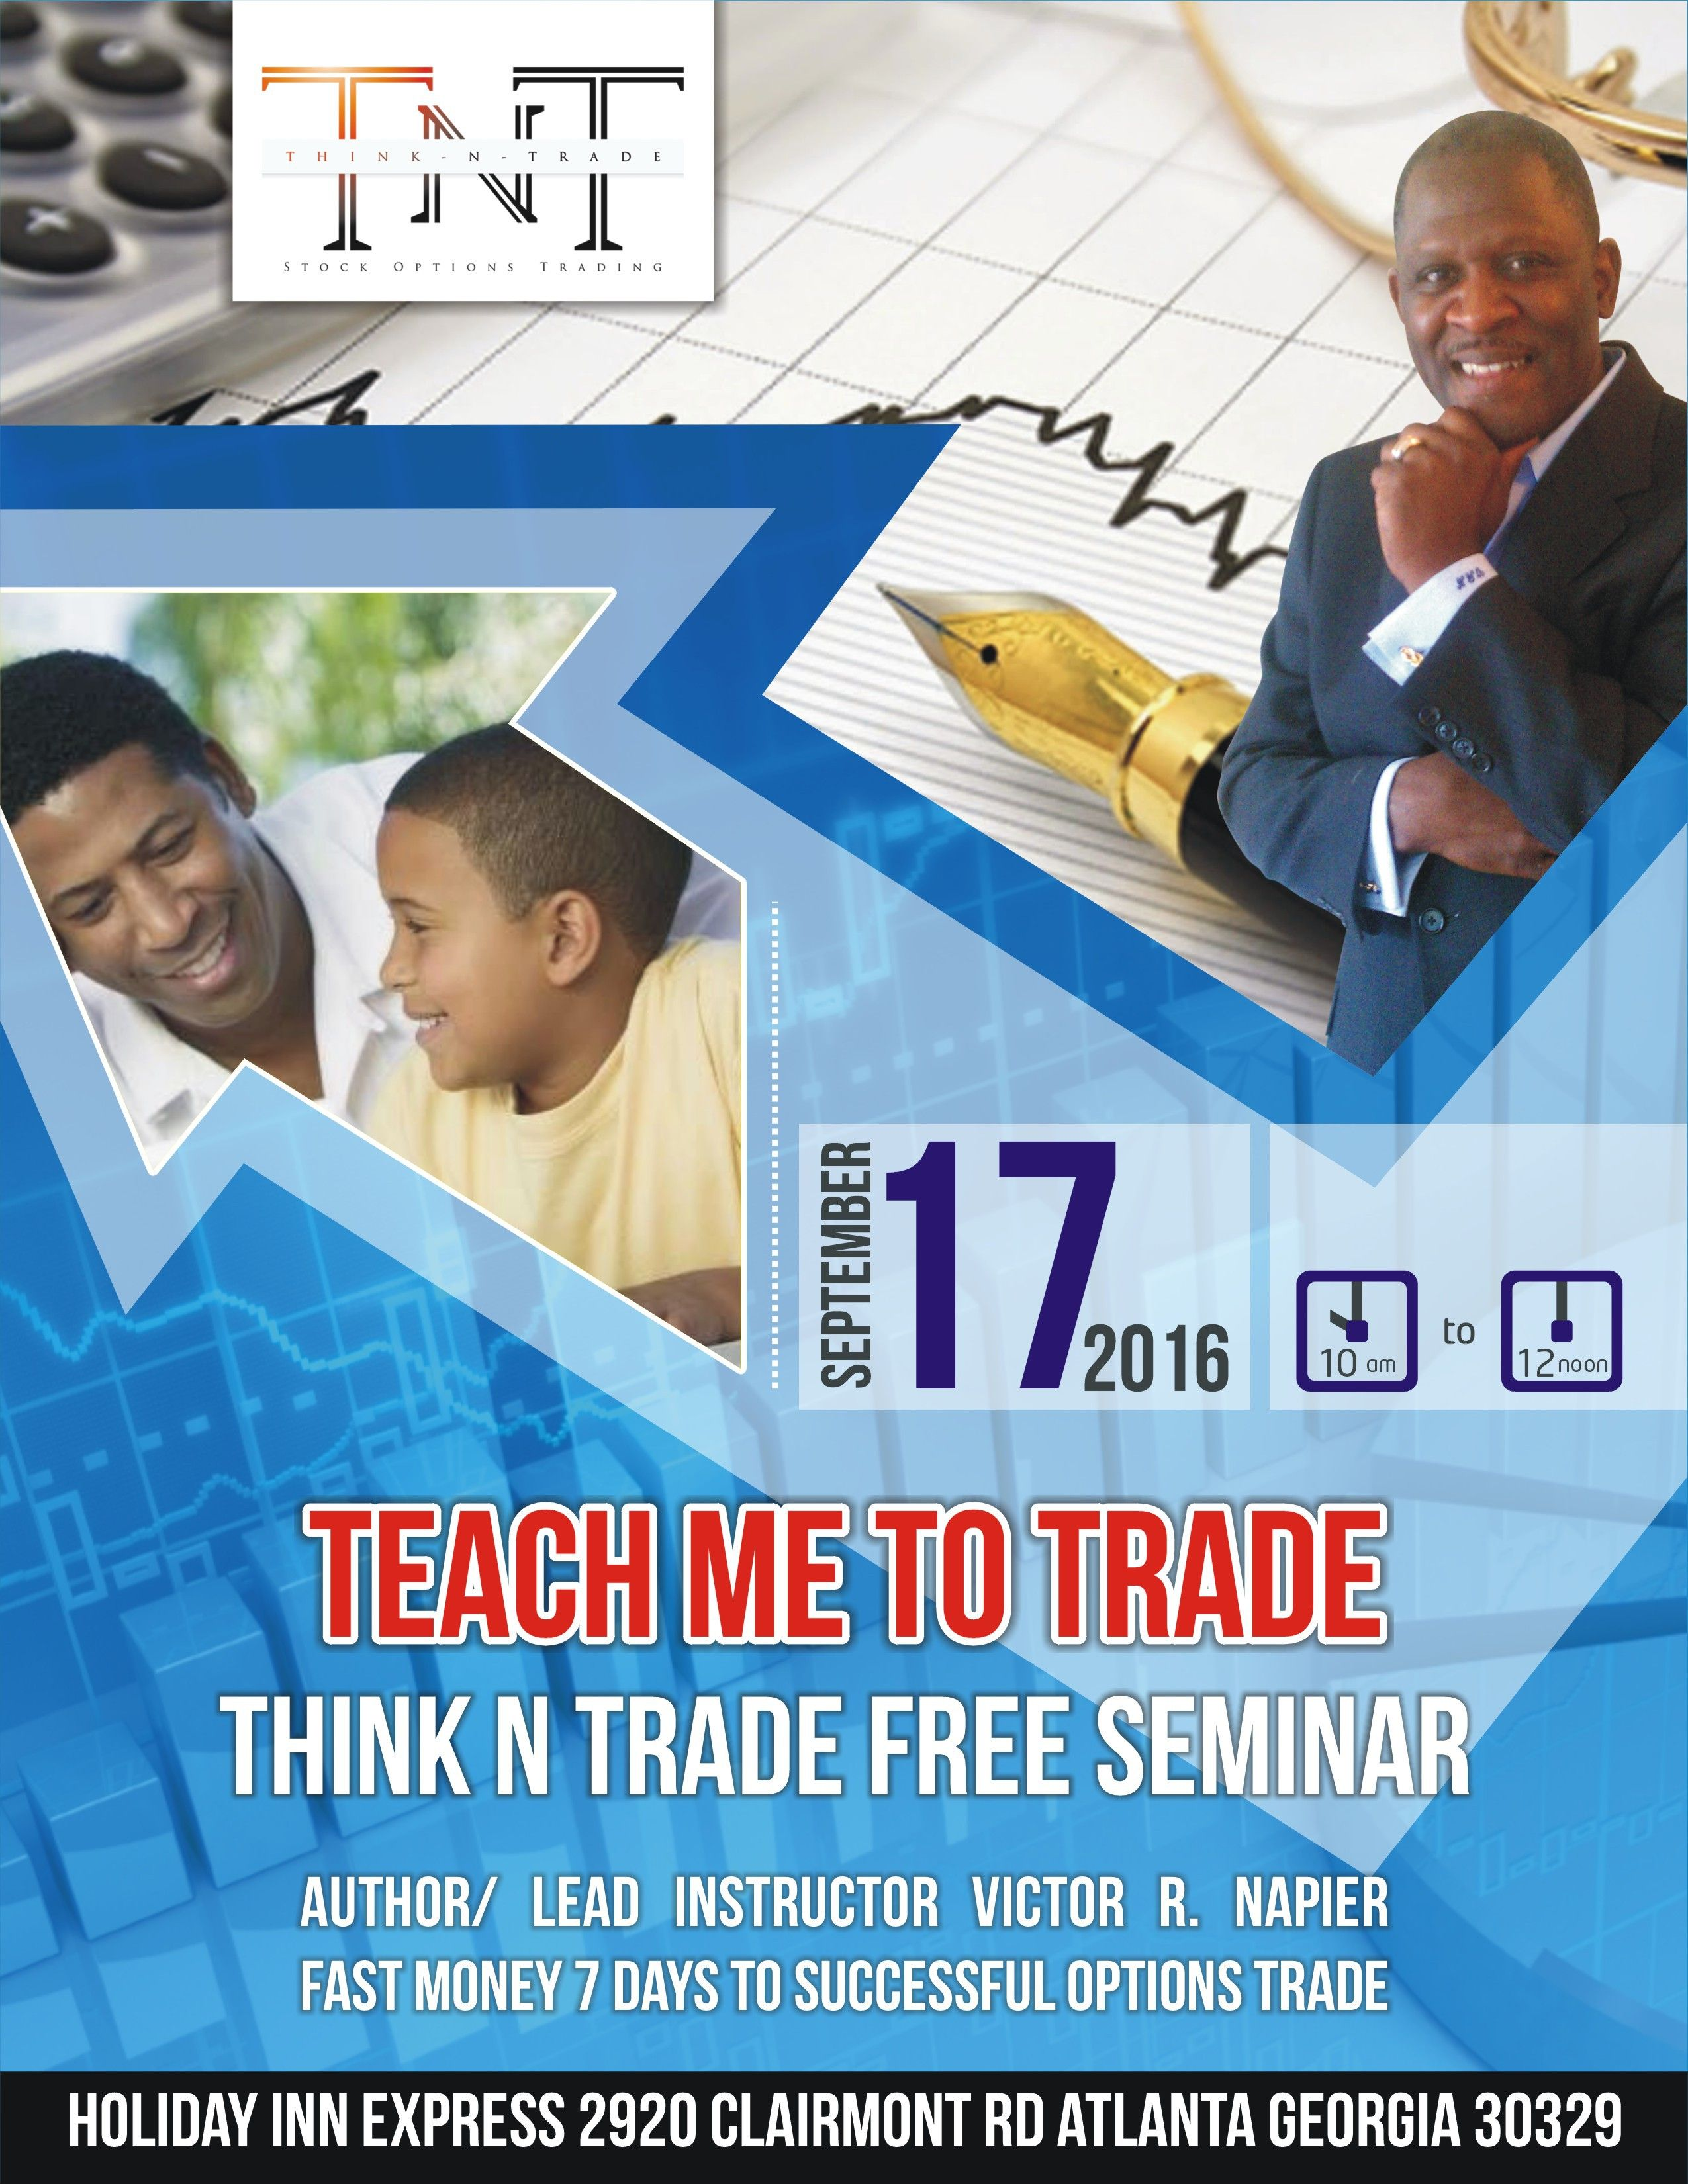 Stock options seminars